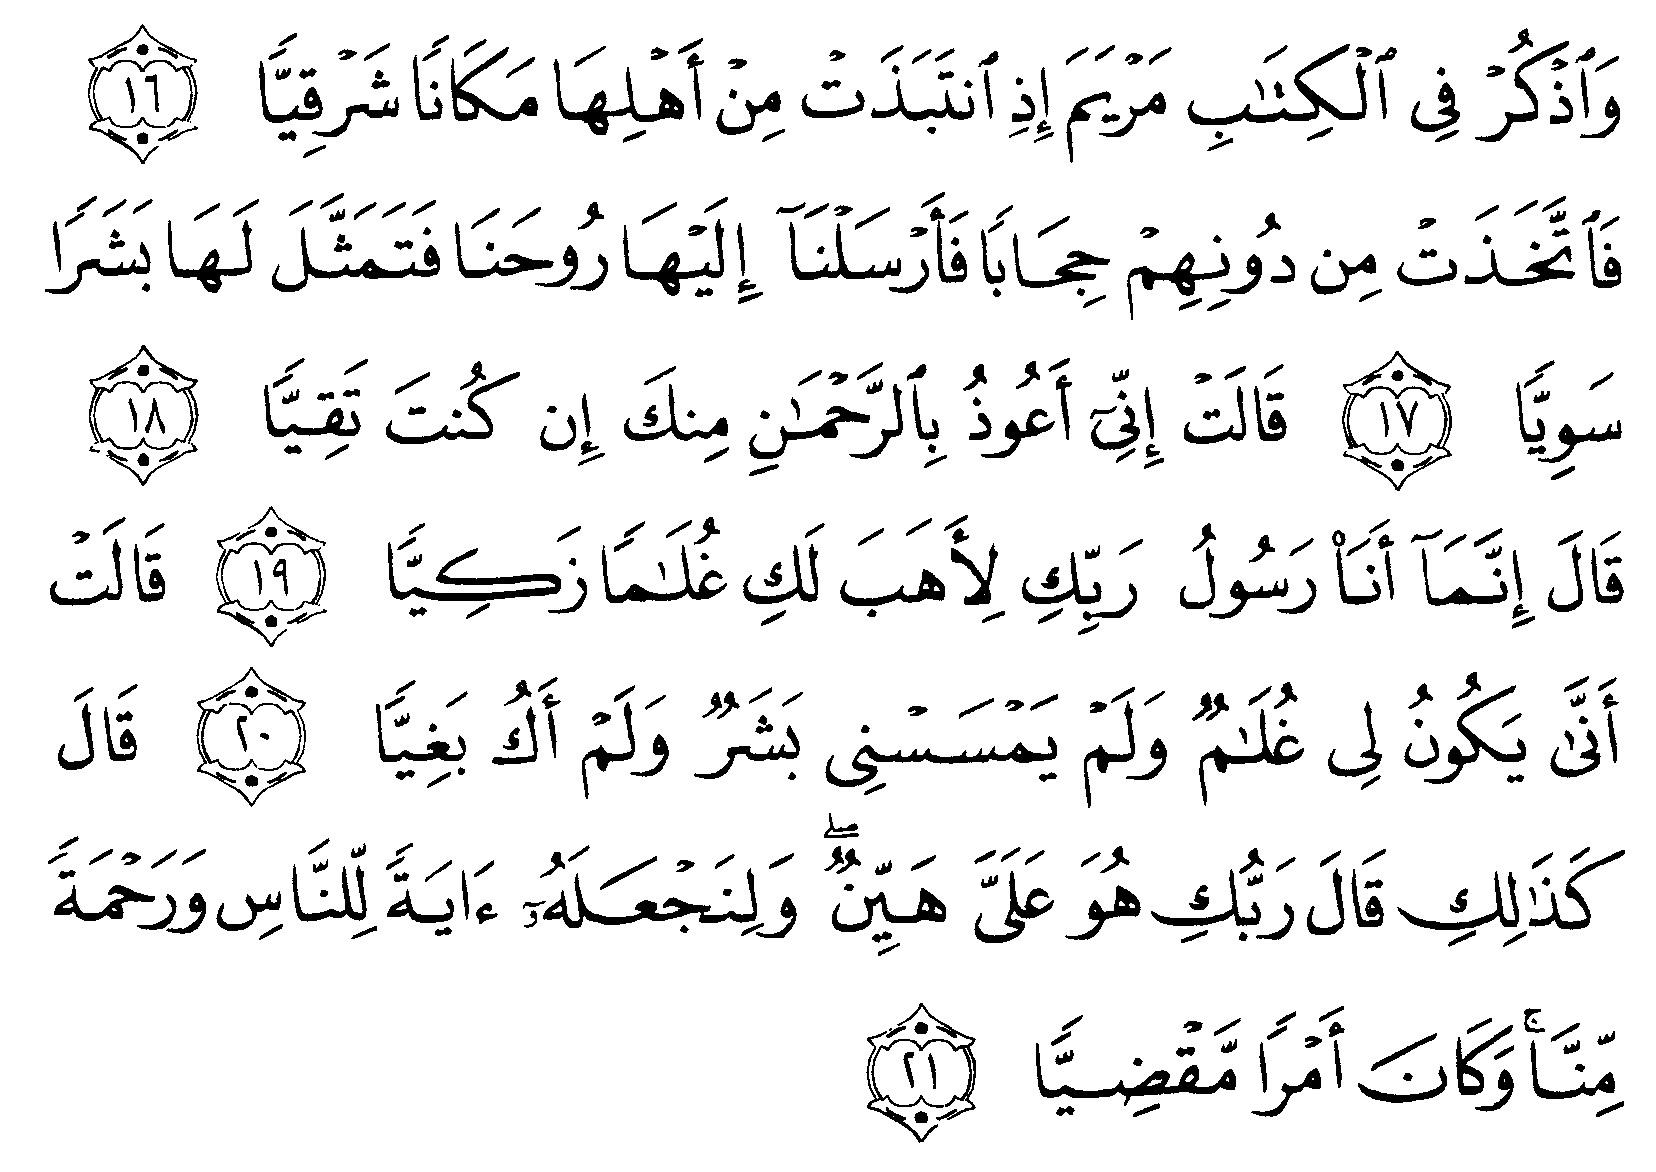 Tafsir Ibnu Katsir Surah Maryam Ayat 16 21 Alquranmulia